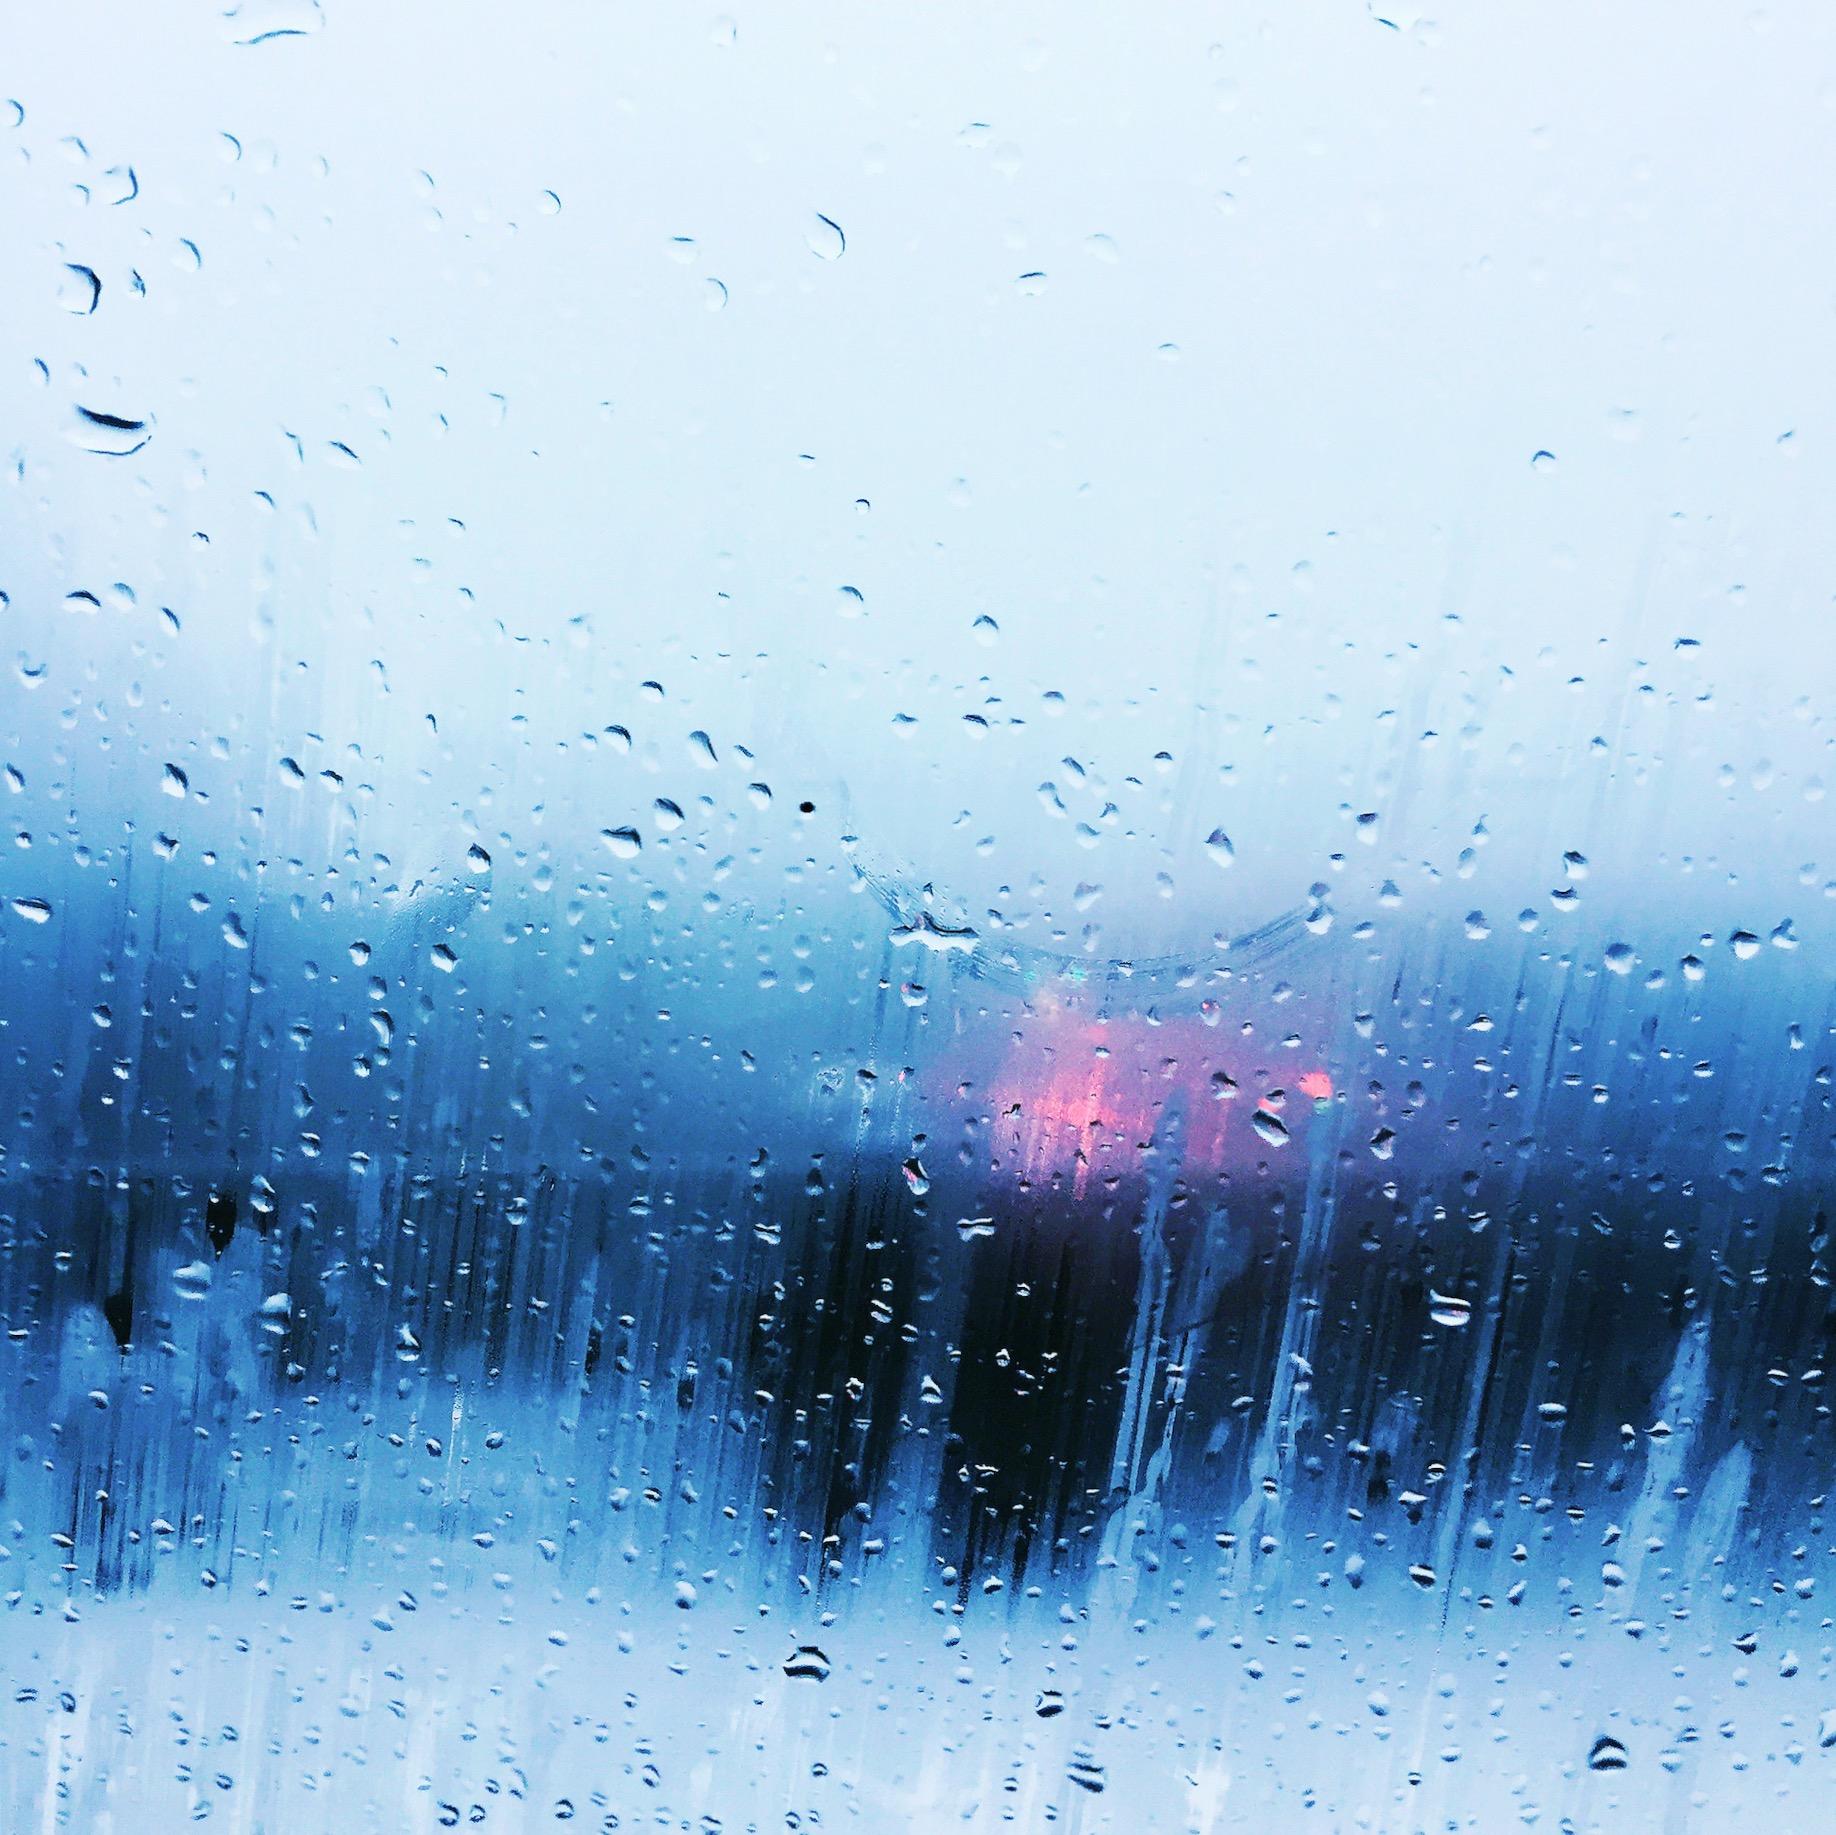 amy_chen_design_blog_winter_foggy_window.jpeg